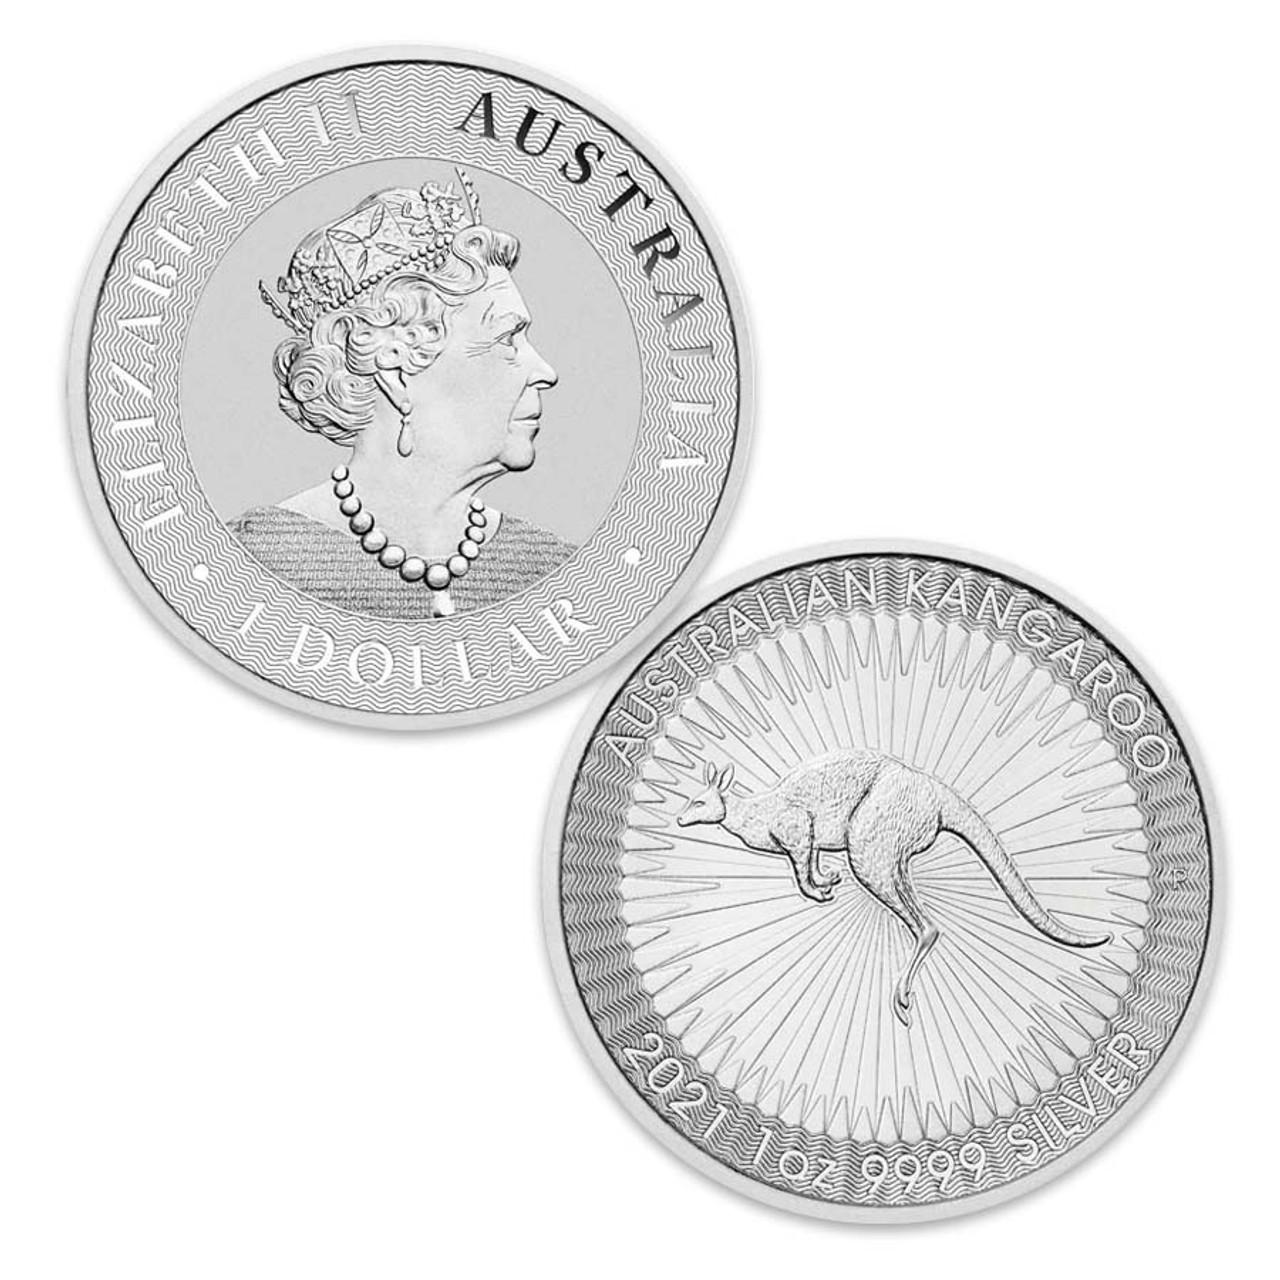 Australia 2021 Kangaroo 1-Oz. Silver Dollar Brilliant Uncirculated